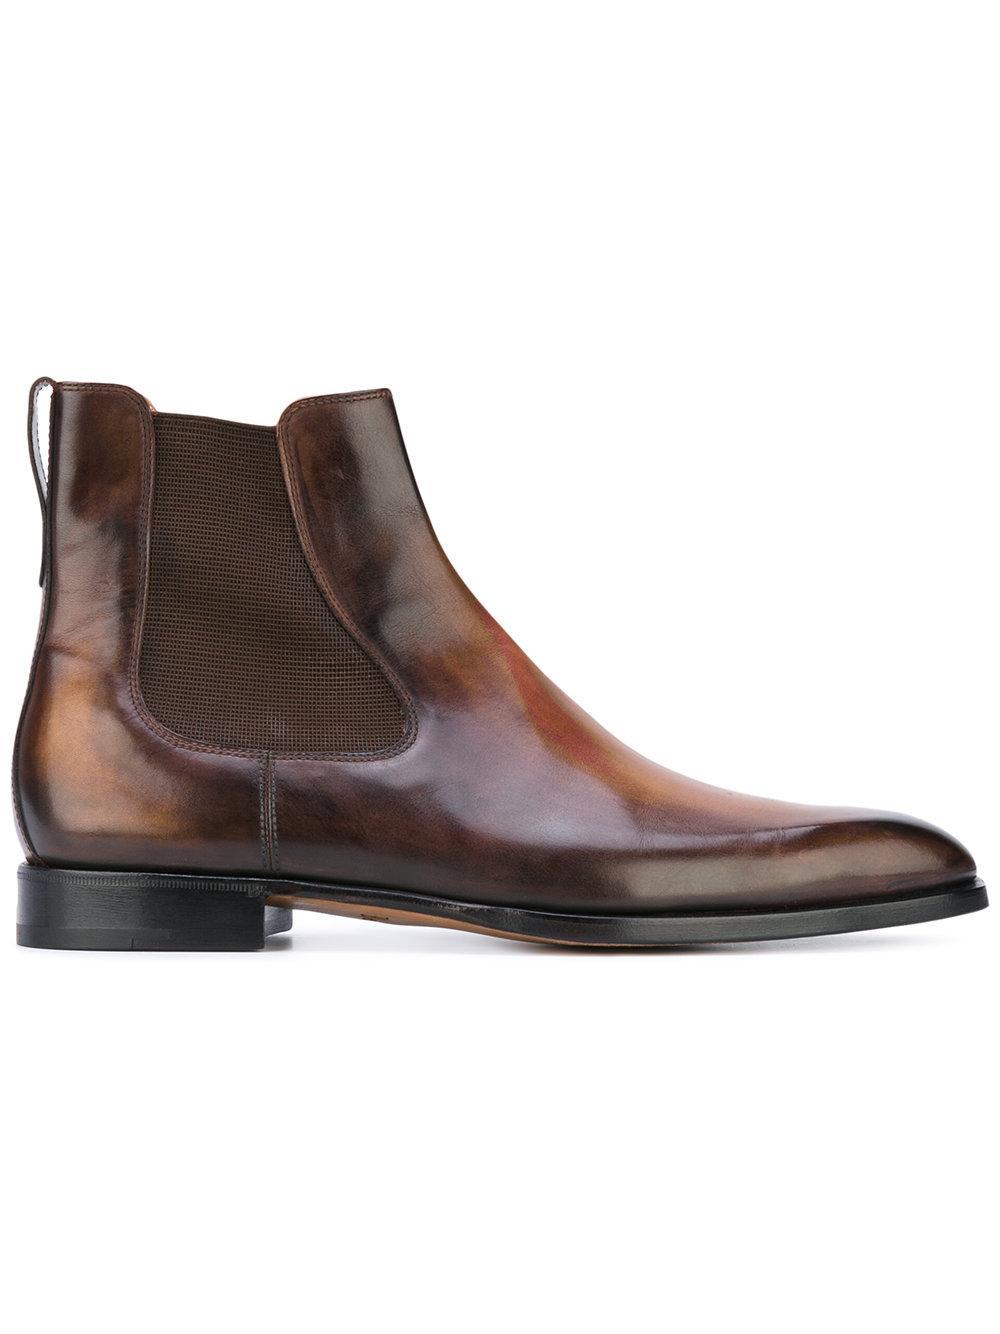 Lyst Berluti Chelsea Boots In Brown For Men